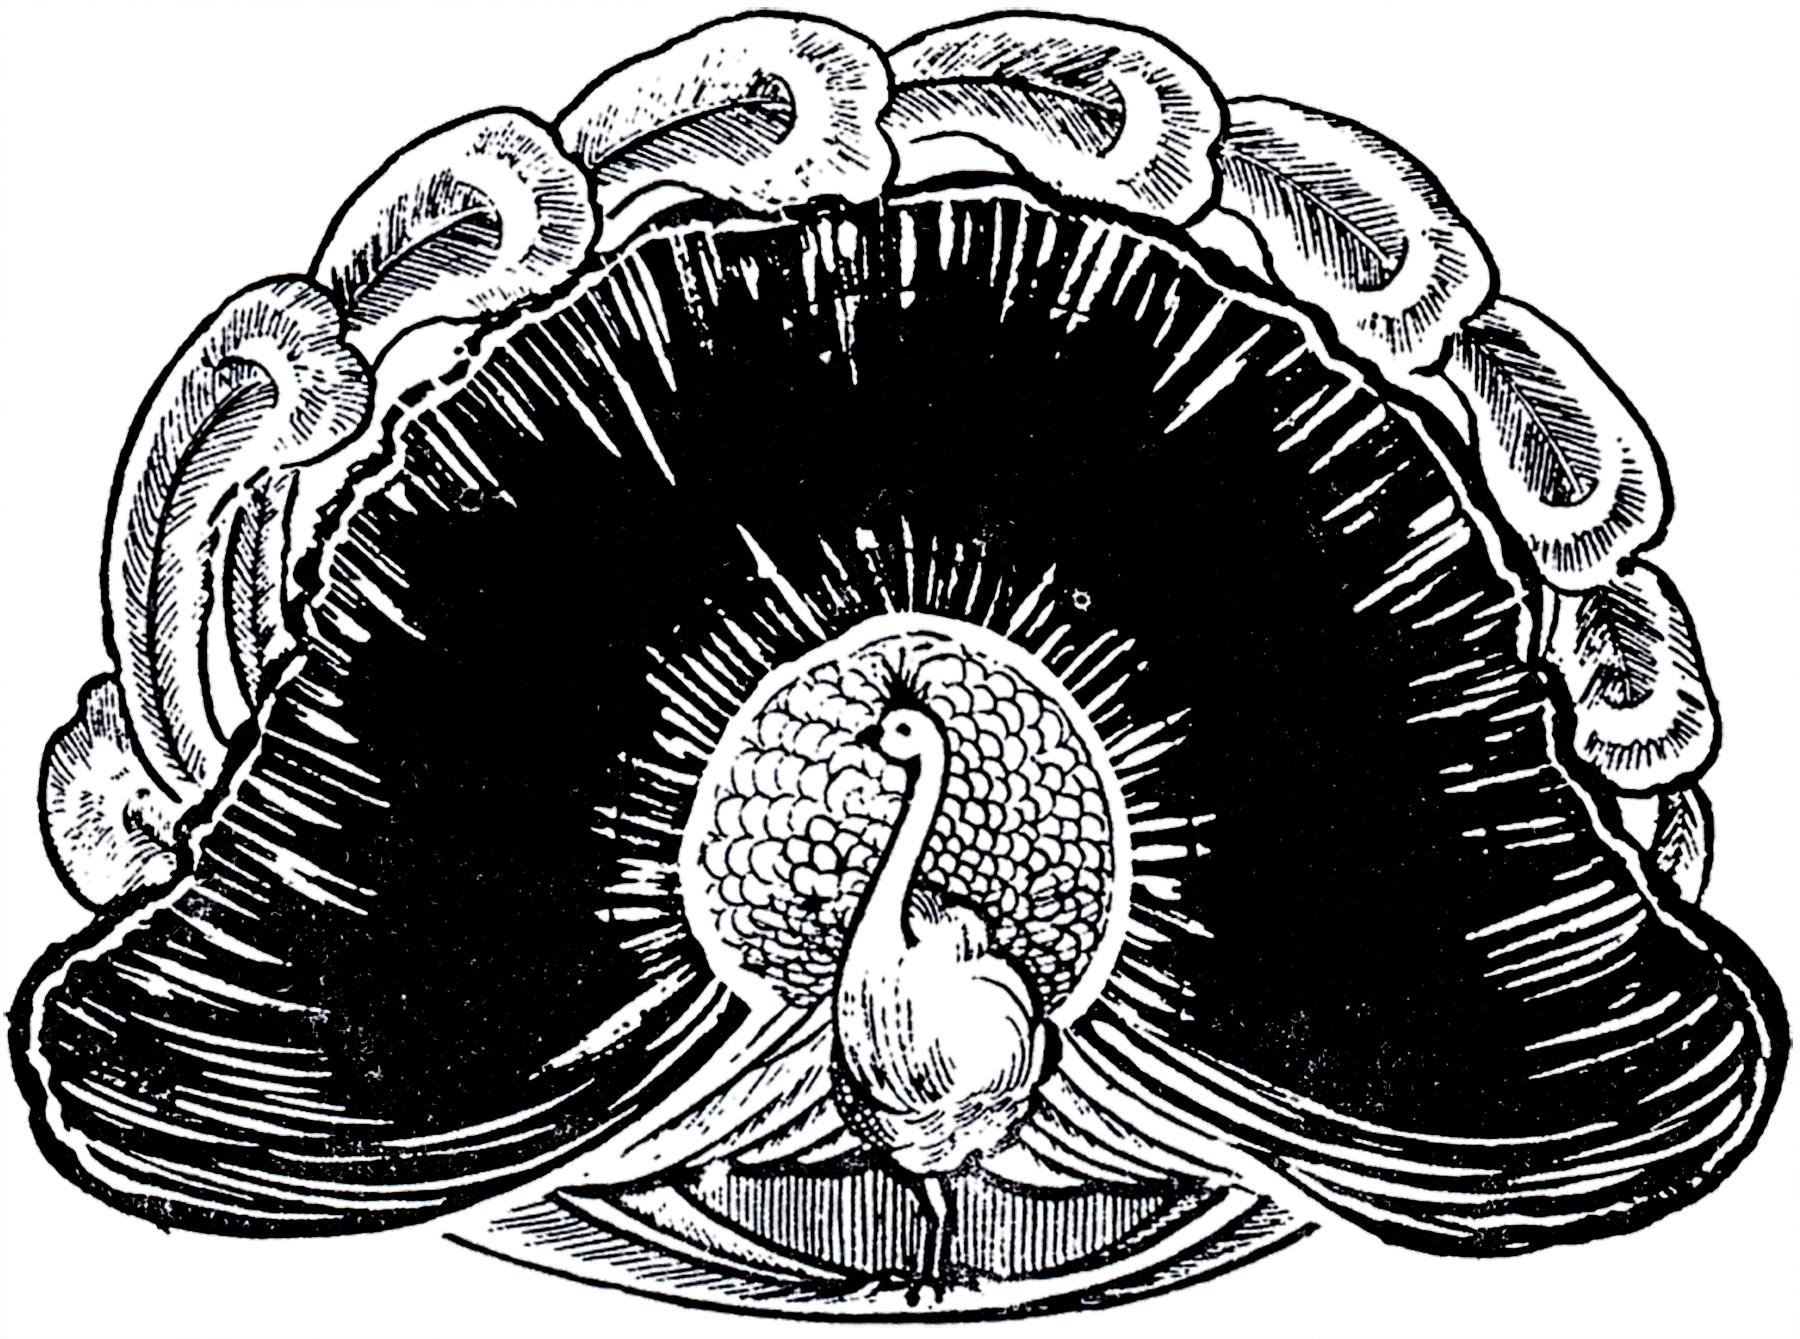 Wonderful Peacock Image The Graphics Fairy